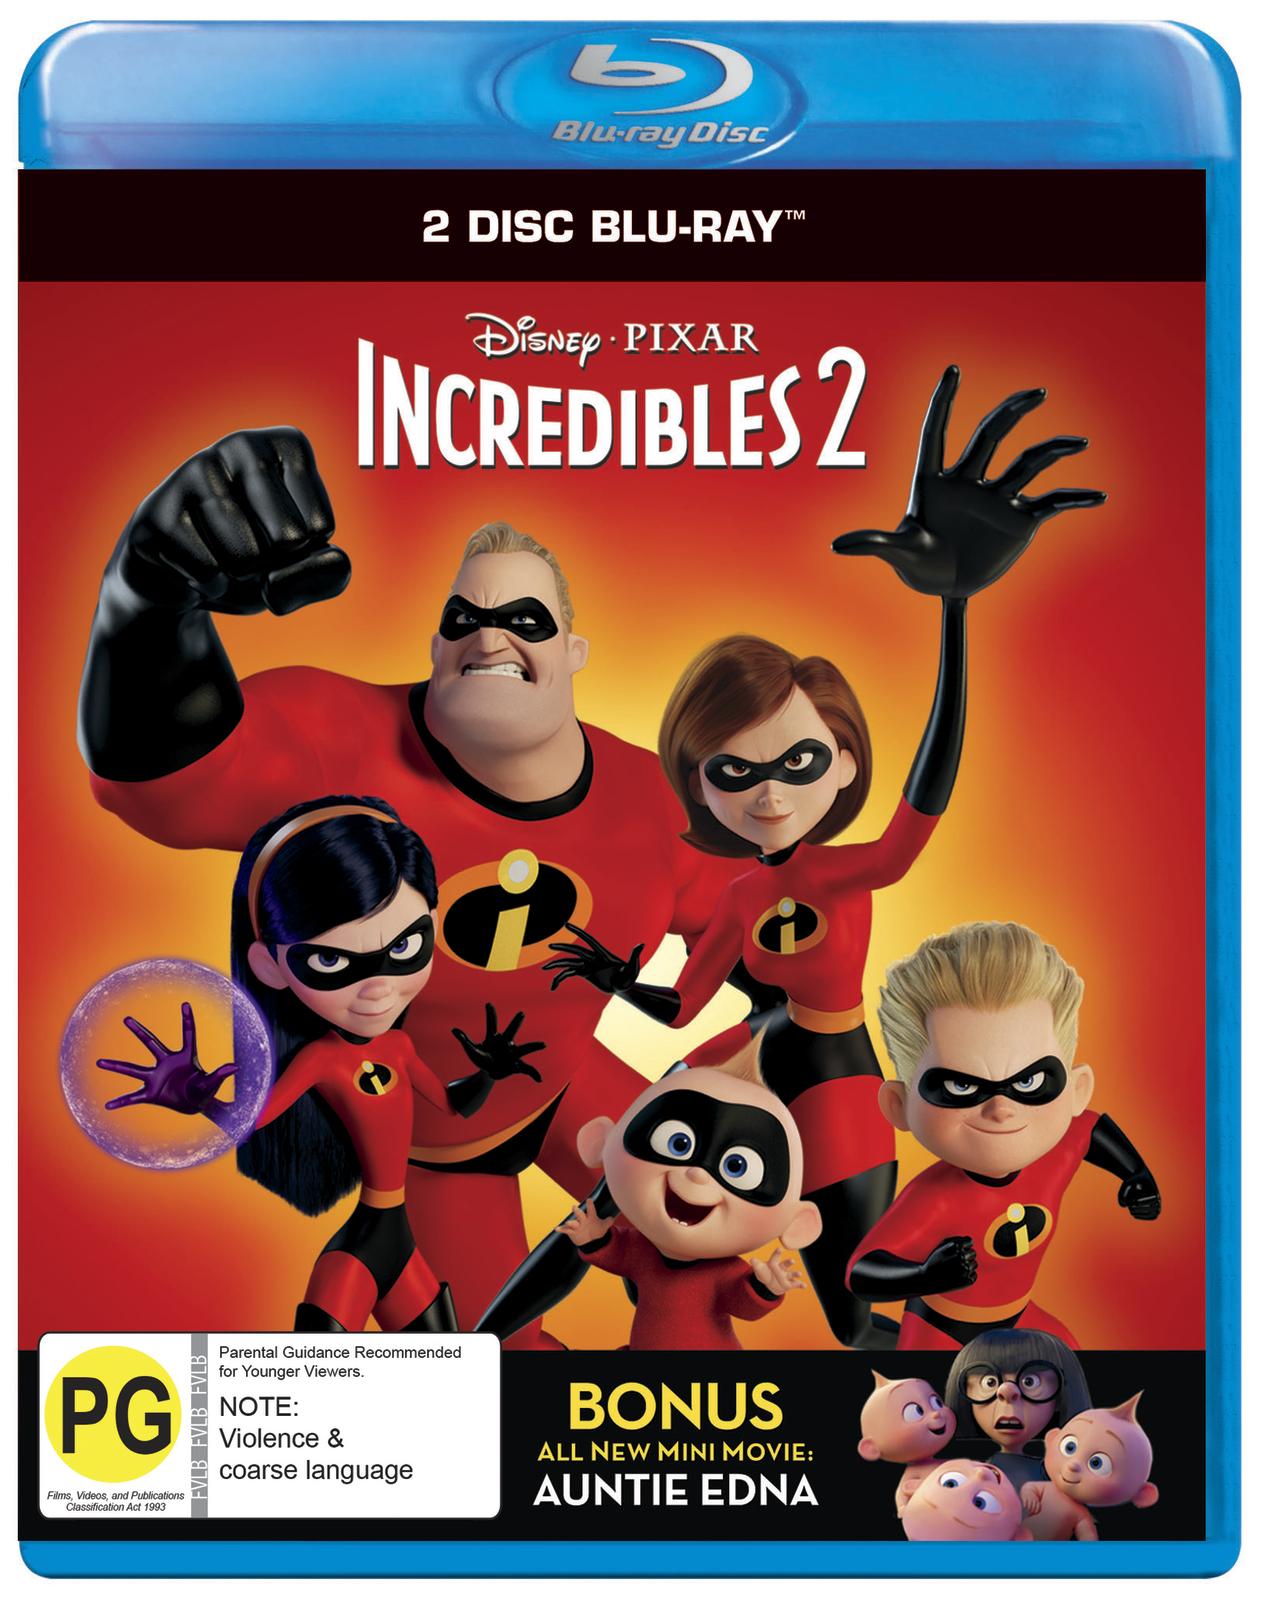 Incredibles 2 on Blu-ray image